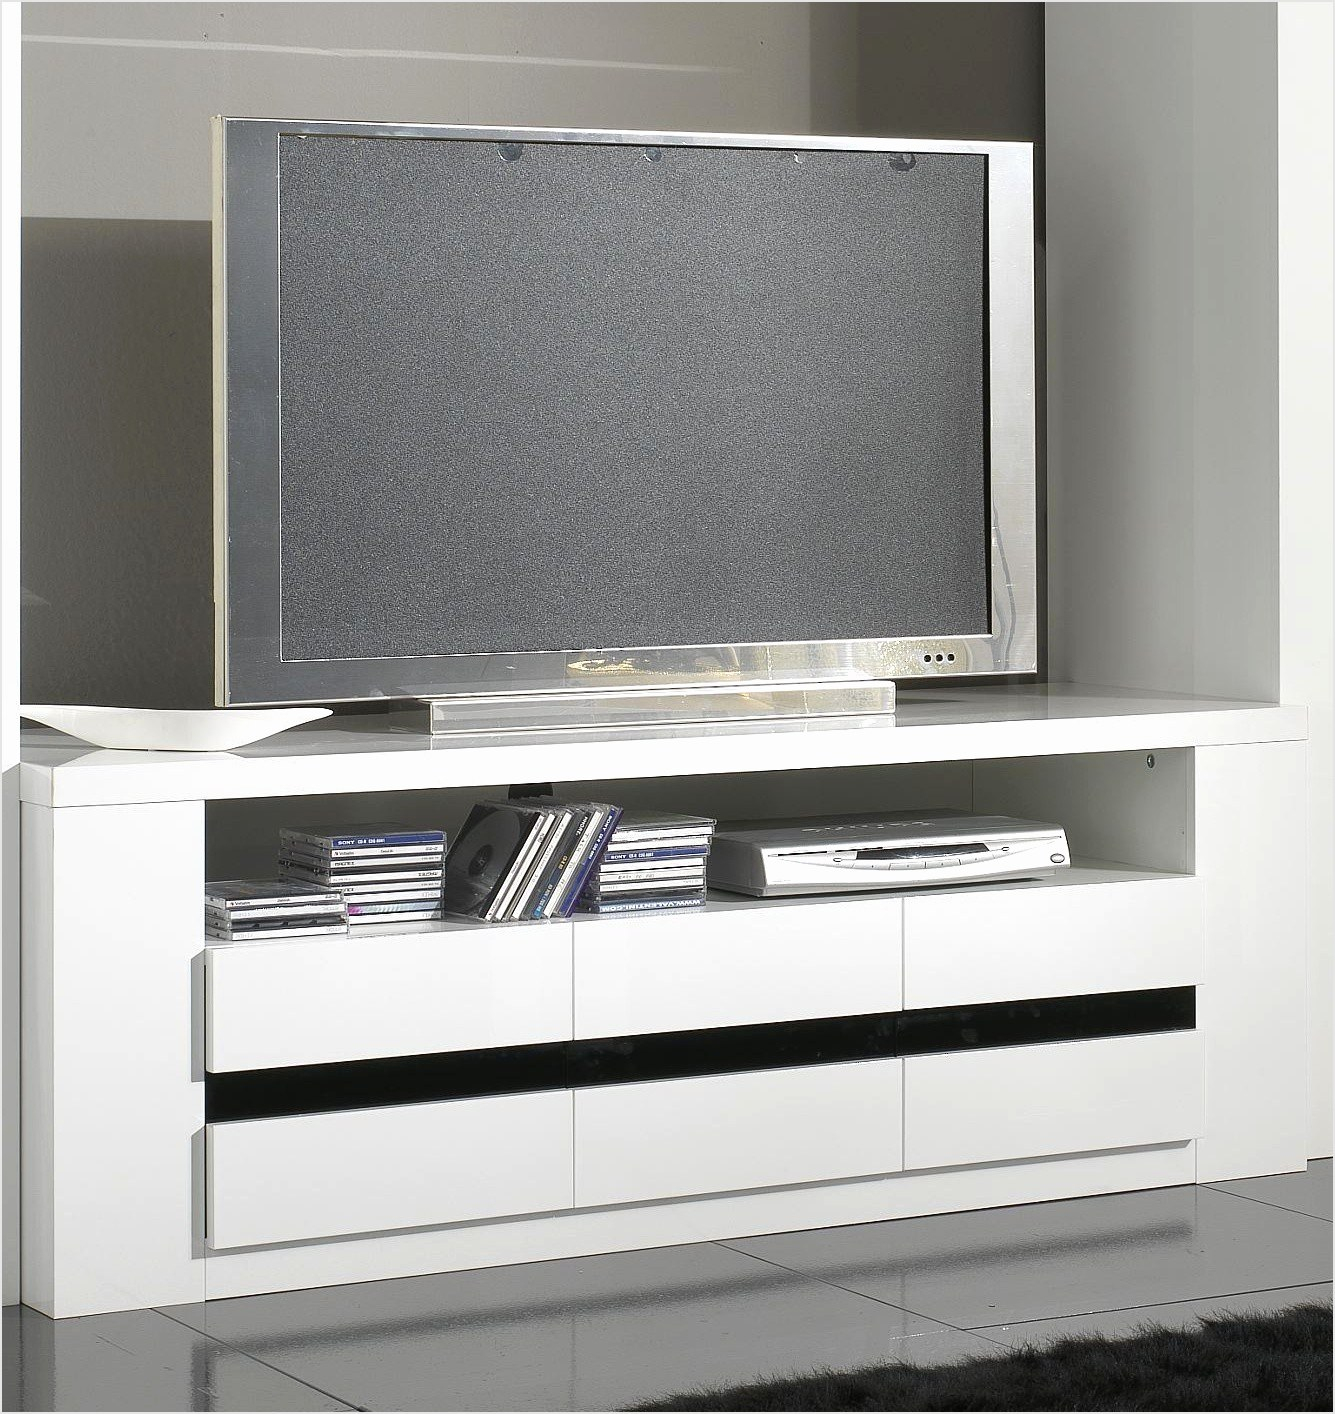 Meuble Télé Angle Ikea - Jeparsazart concernant Meuble Tv Vertigo But